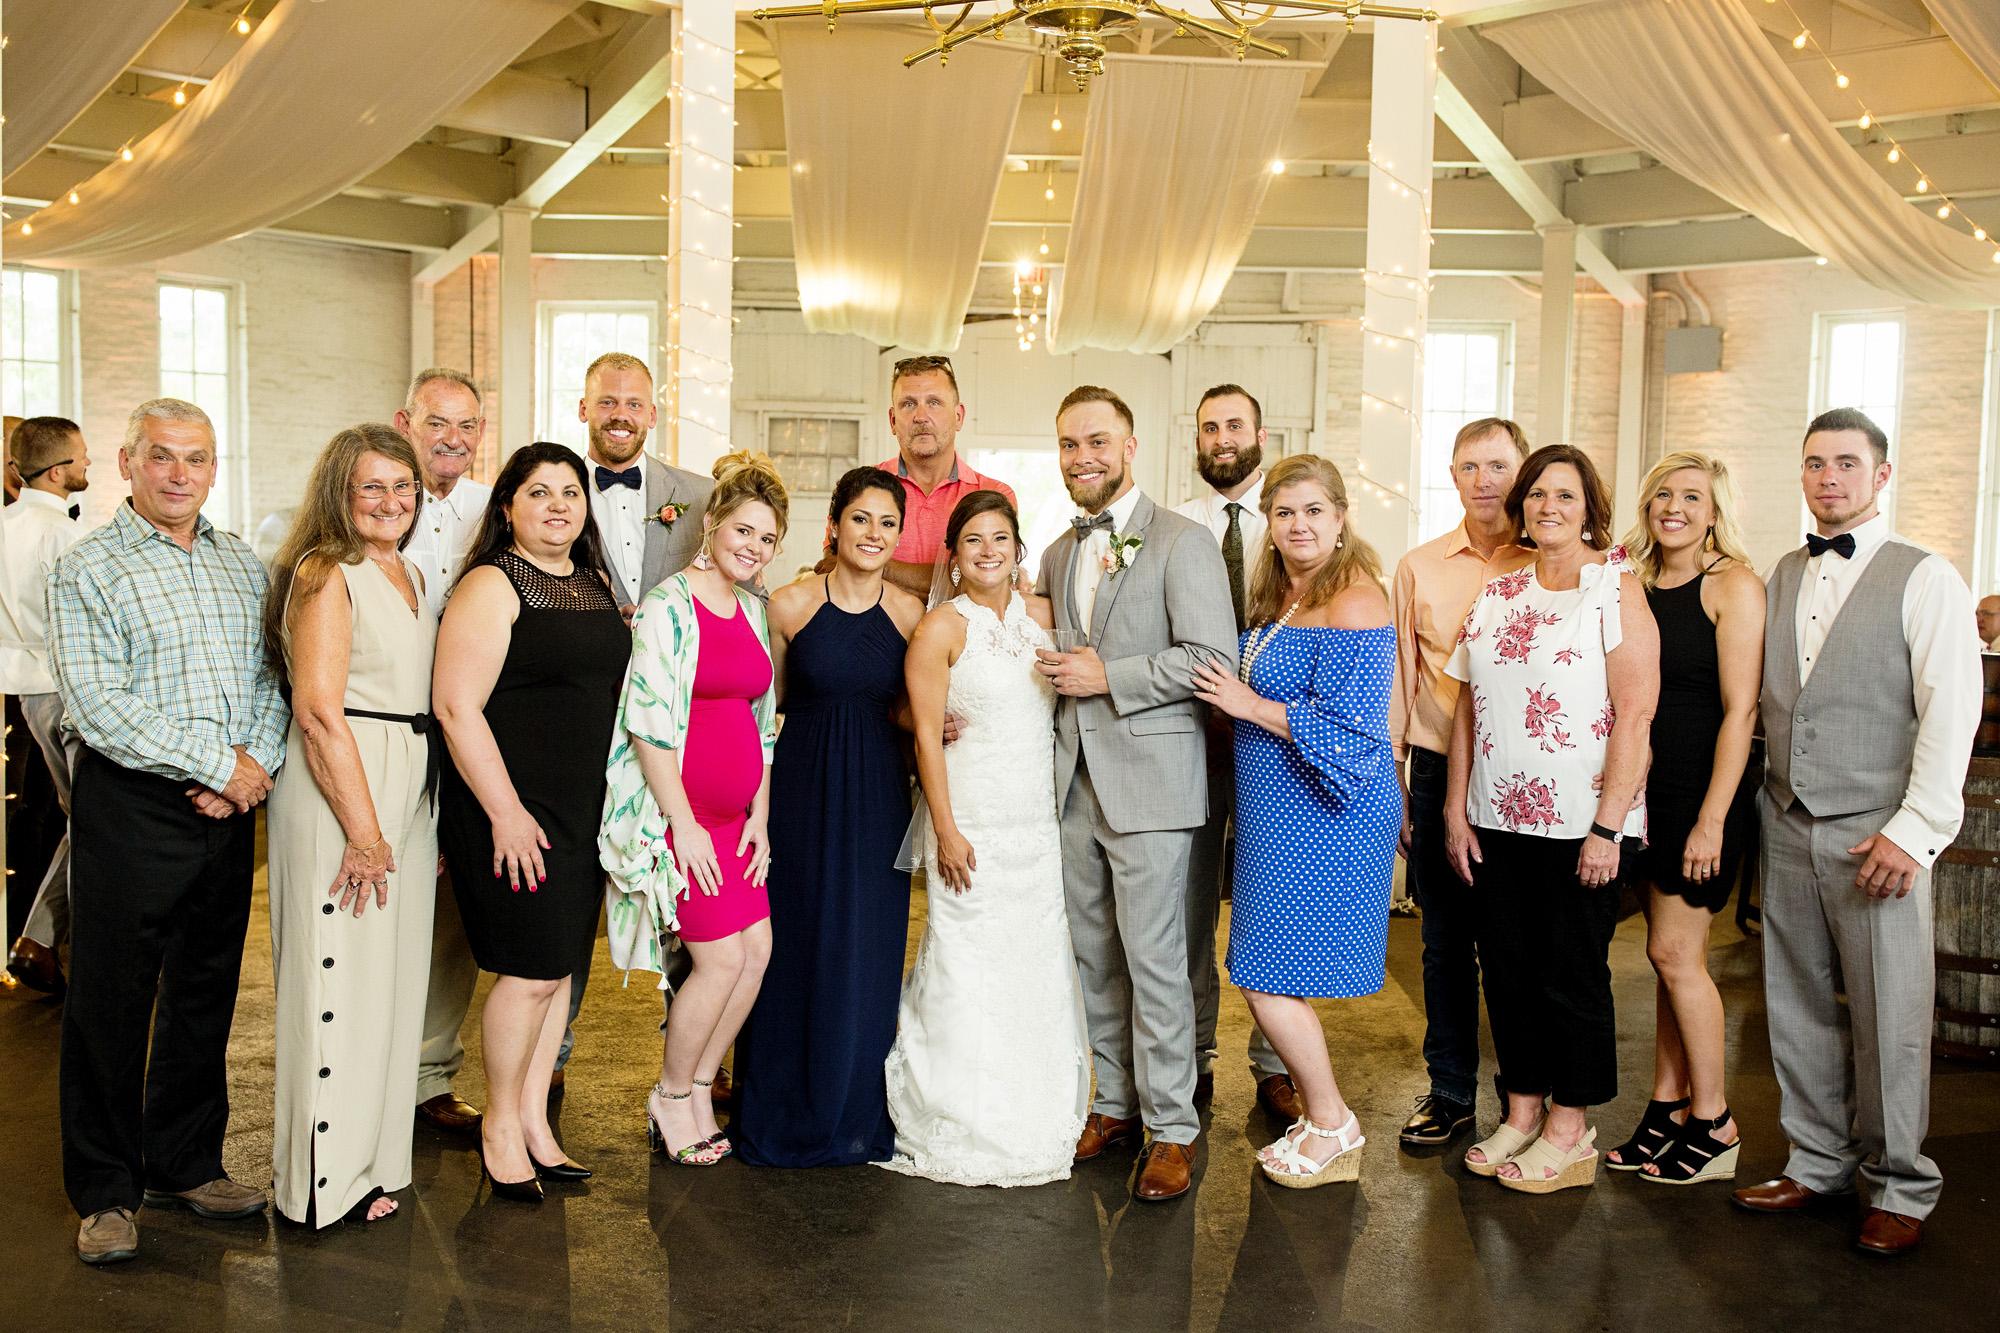 Seriously_Sabrina_Photography_Lexington_Kentucky_Round_Barn_Red_Mile_Stable_of_Memories_Wedding_Hart_104.jpg